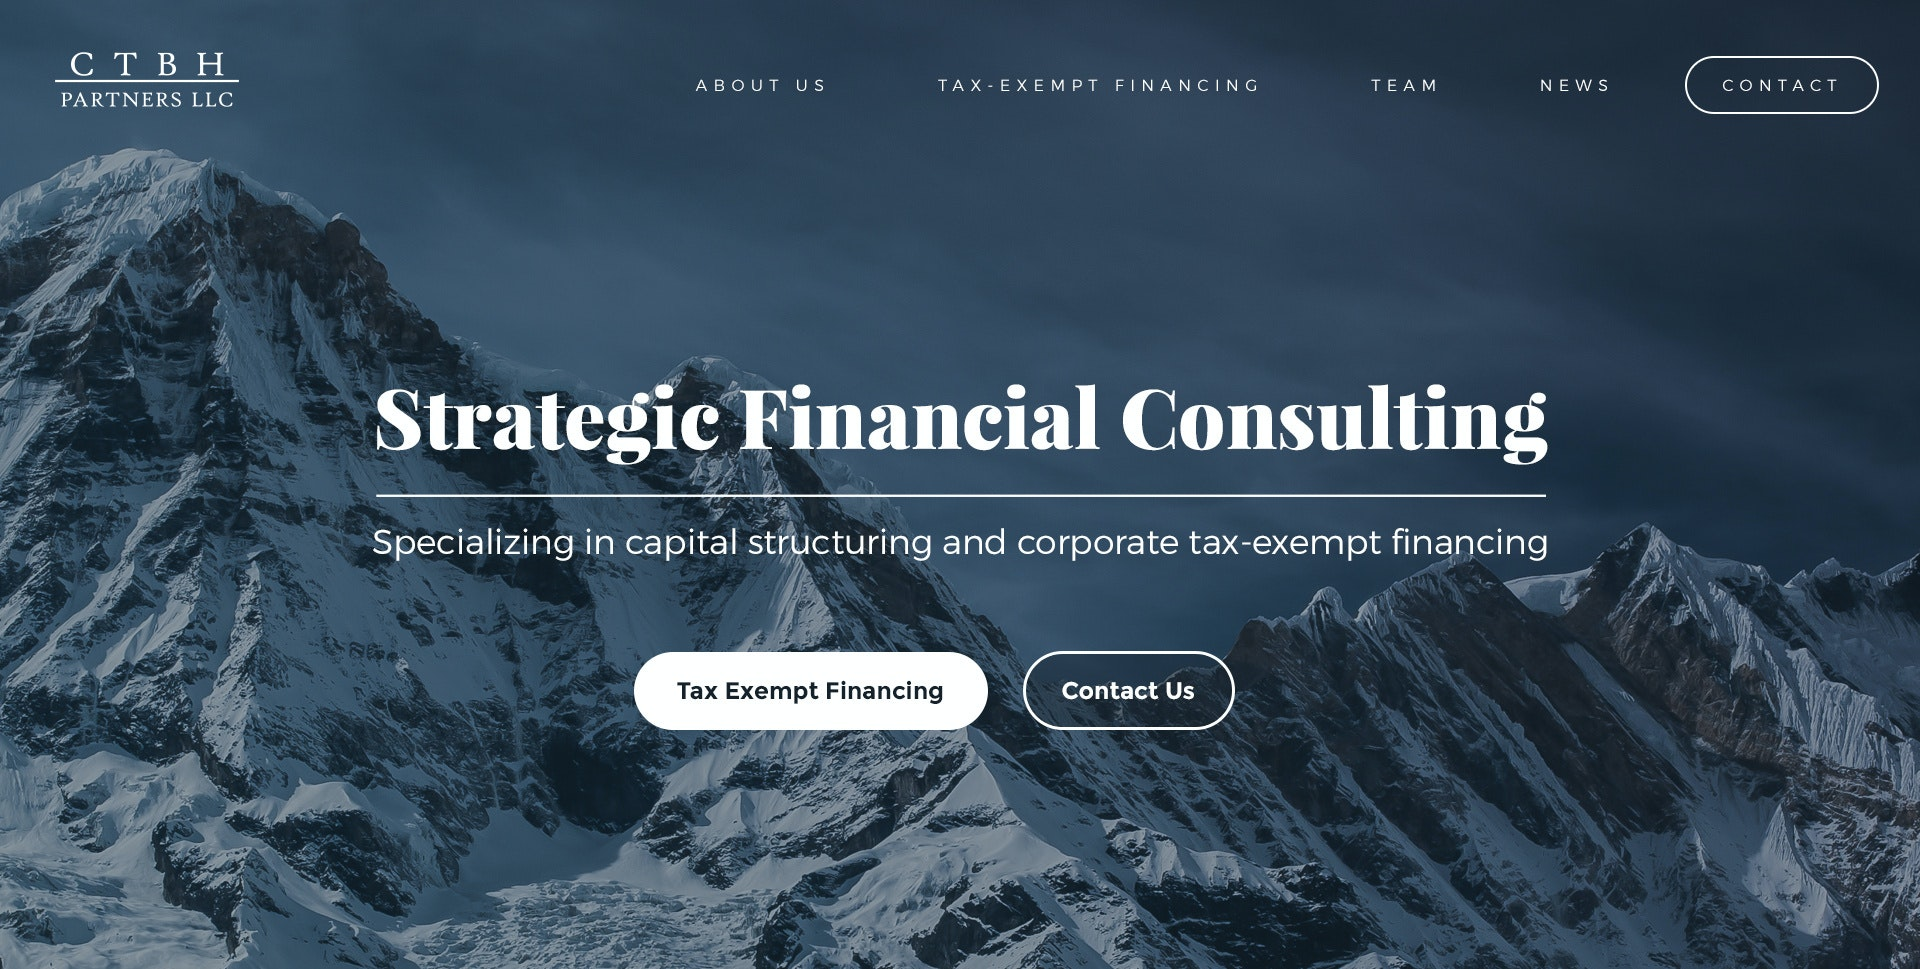 CTBH Partners, LLC web page design